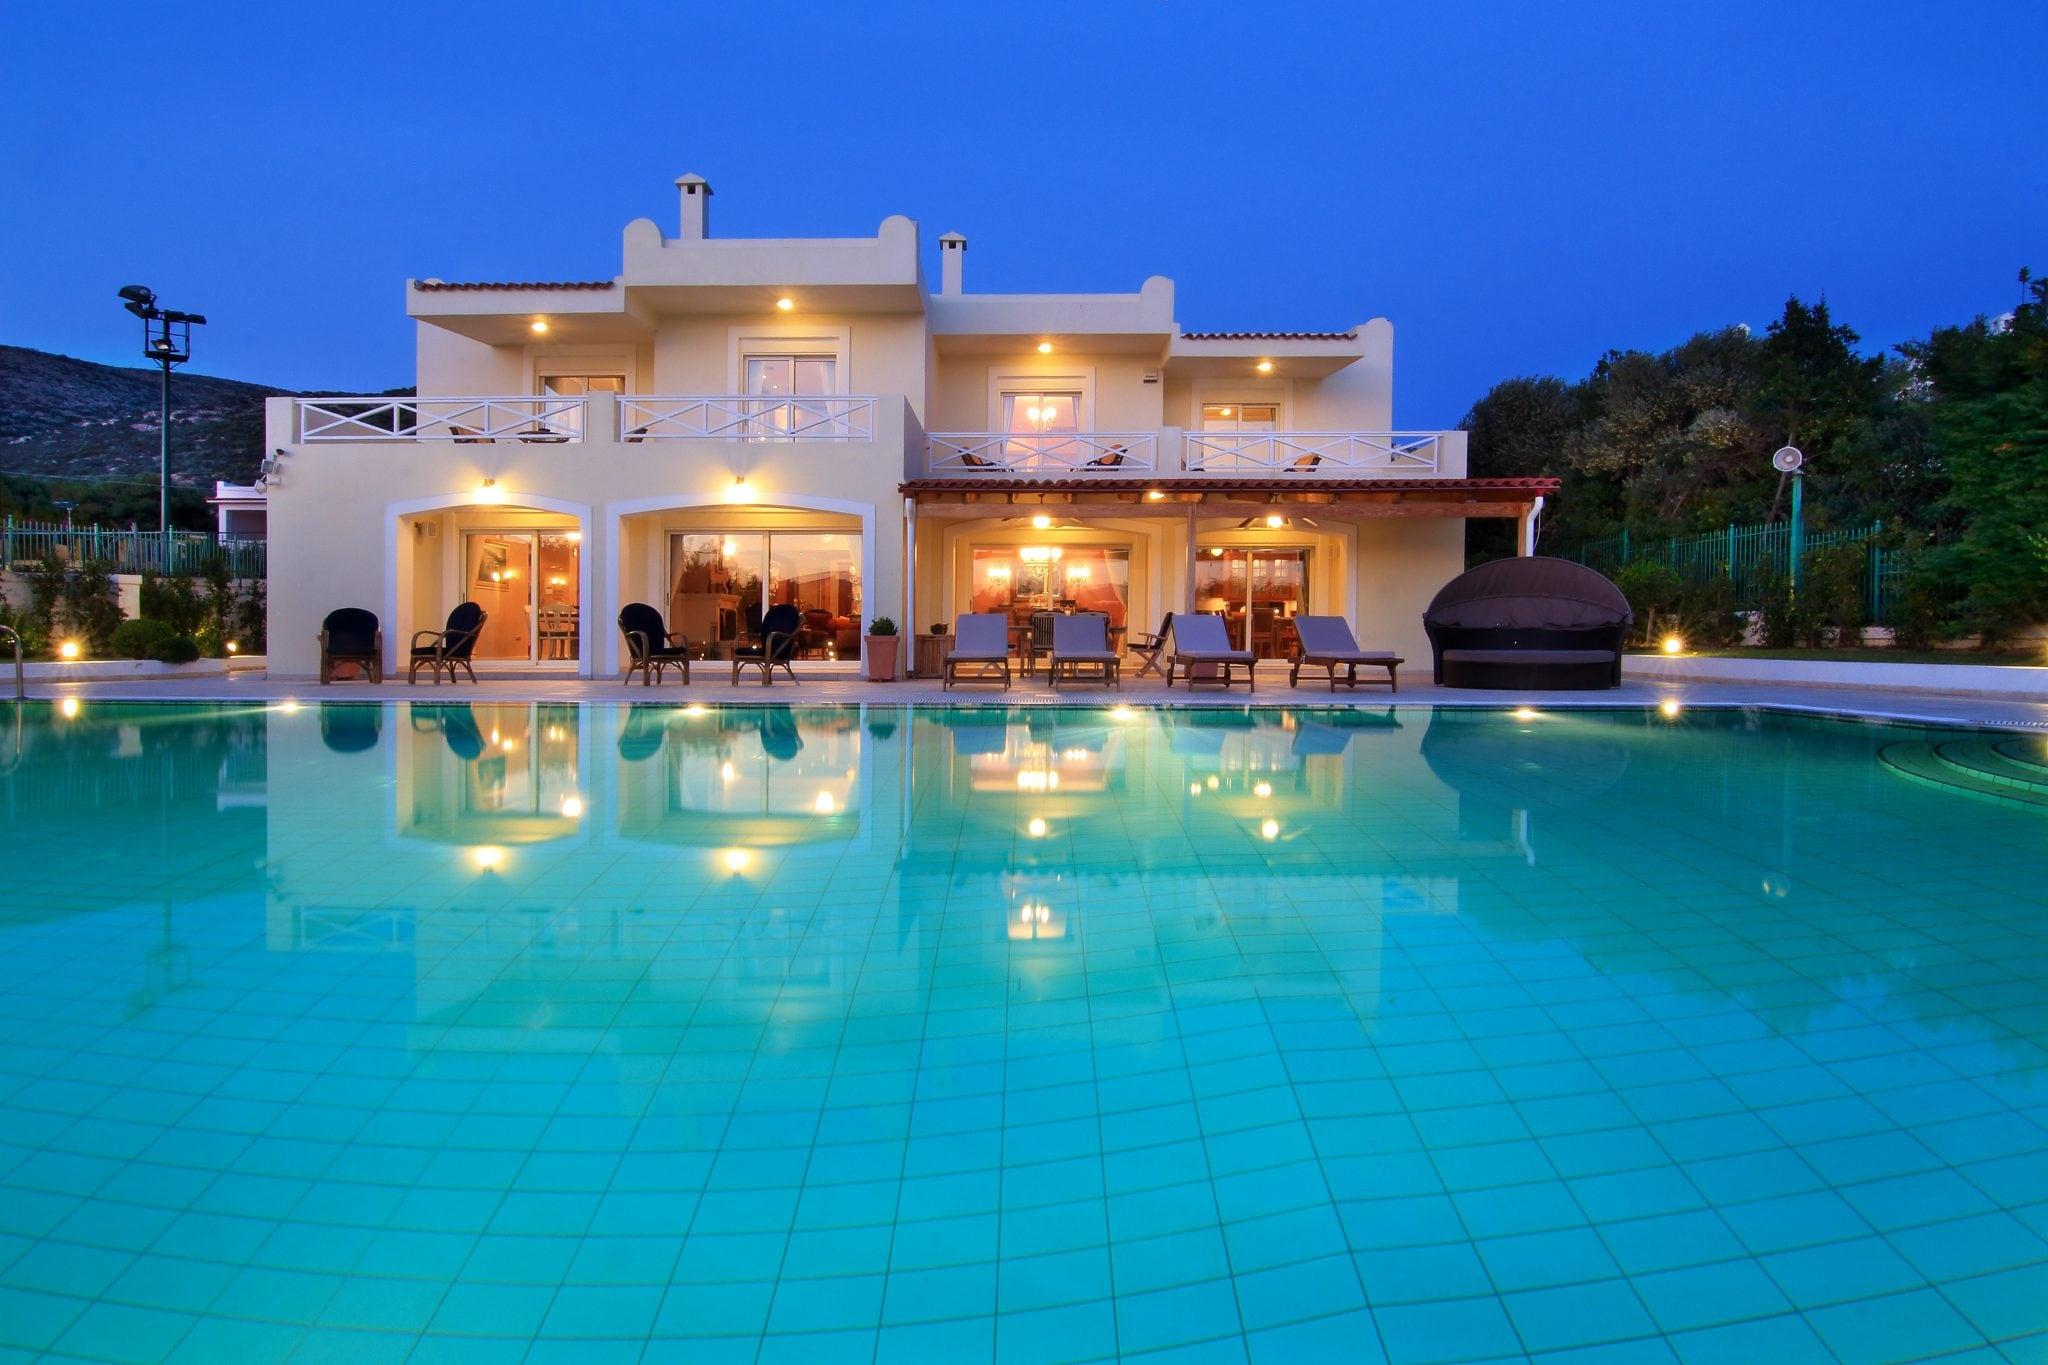 Maison, Saronida - Ref GR-4641